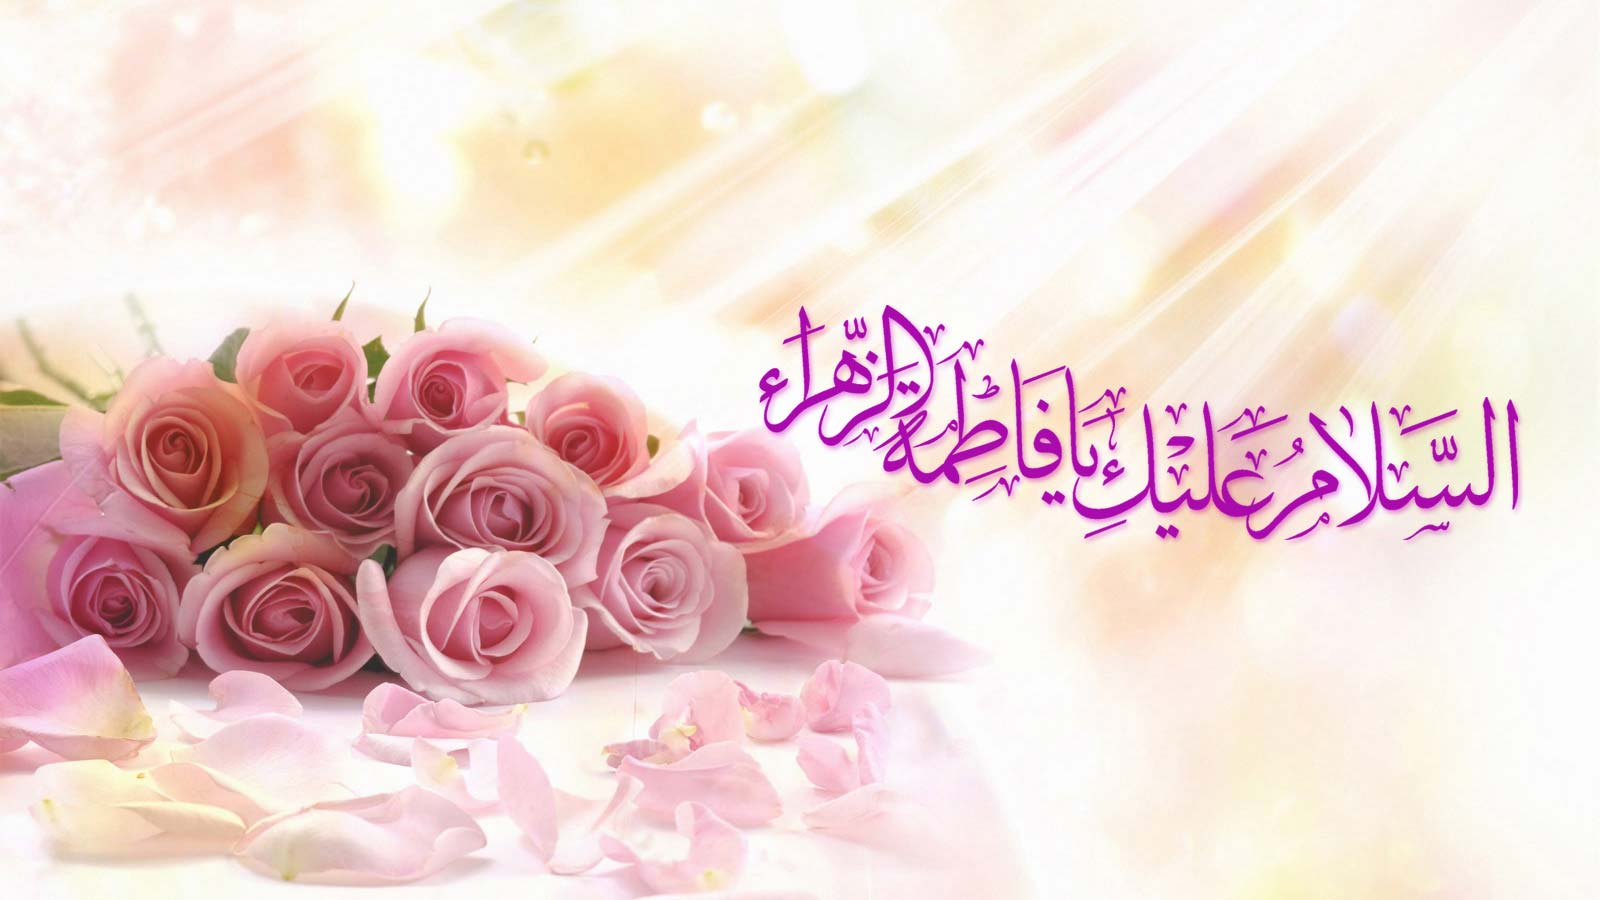 بالصور صور اسم زهراء , معنى اسم زهراء 6682 6